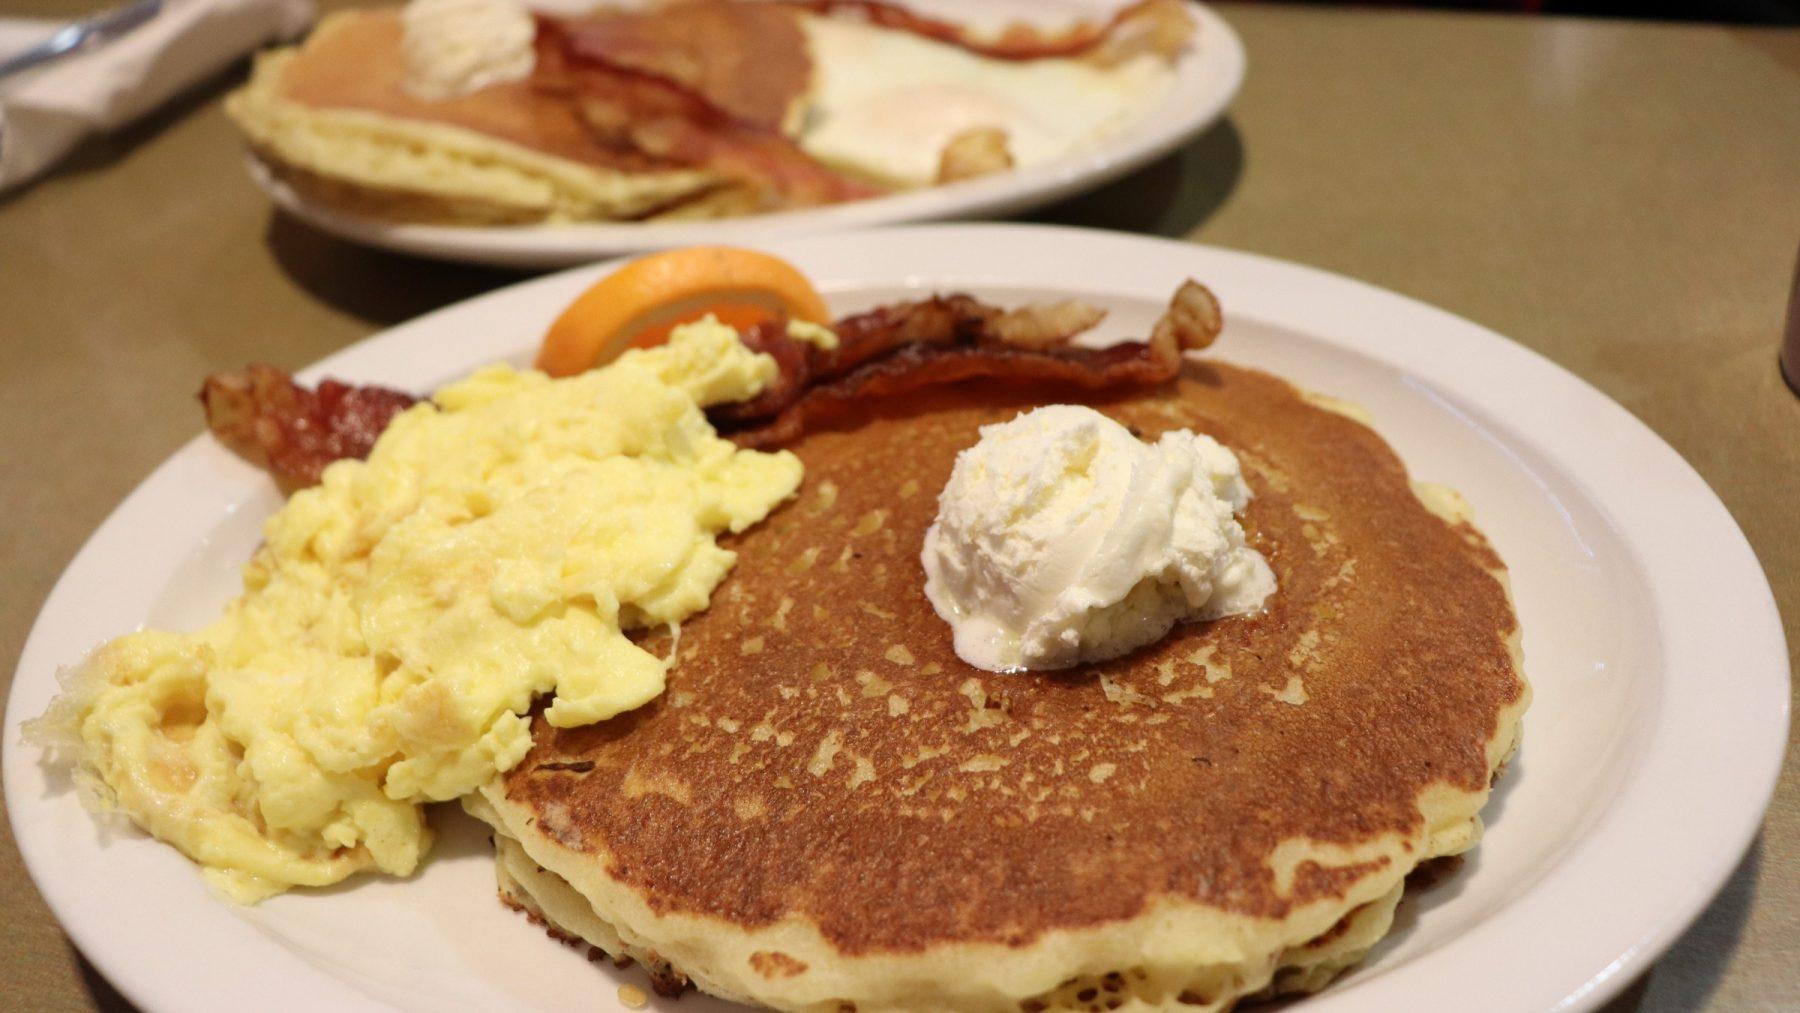 pancakes at ladysmith family restaurant rusk county wi